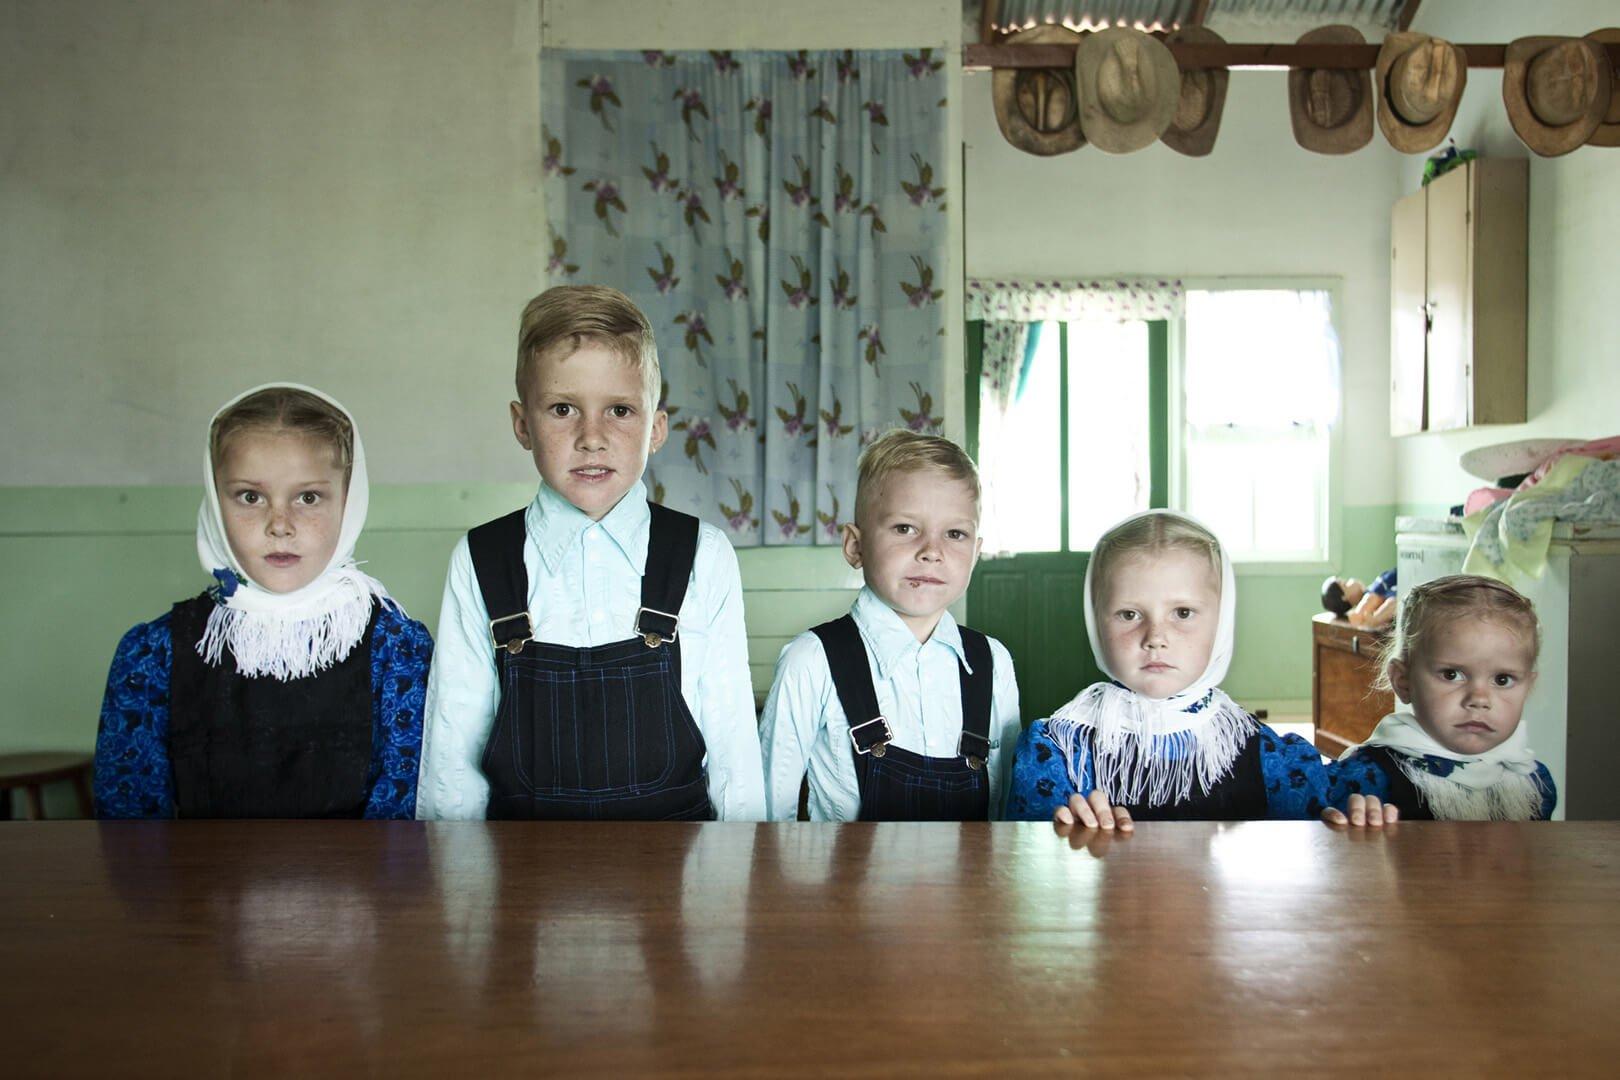 Mennonite children by Jordy Ruiz Cirera